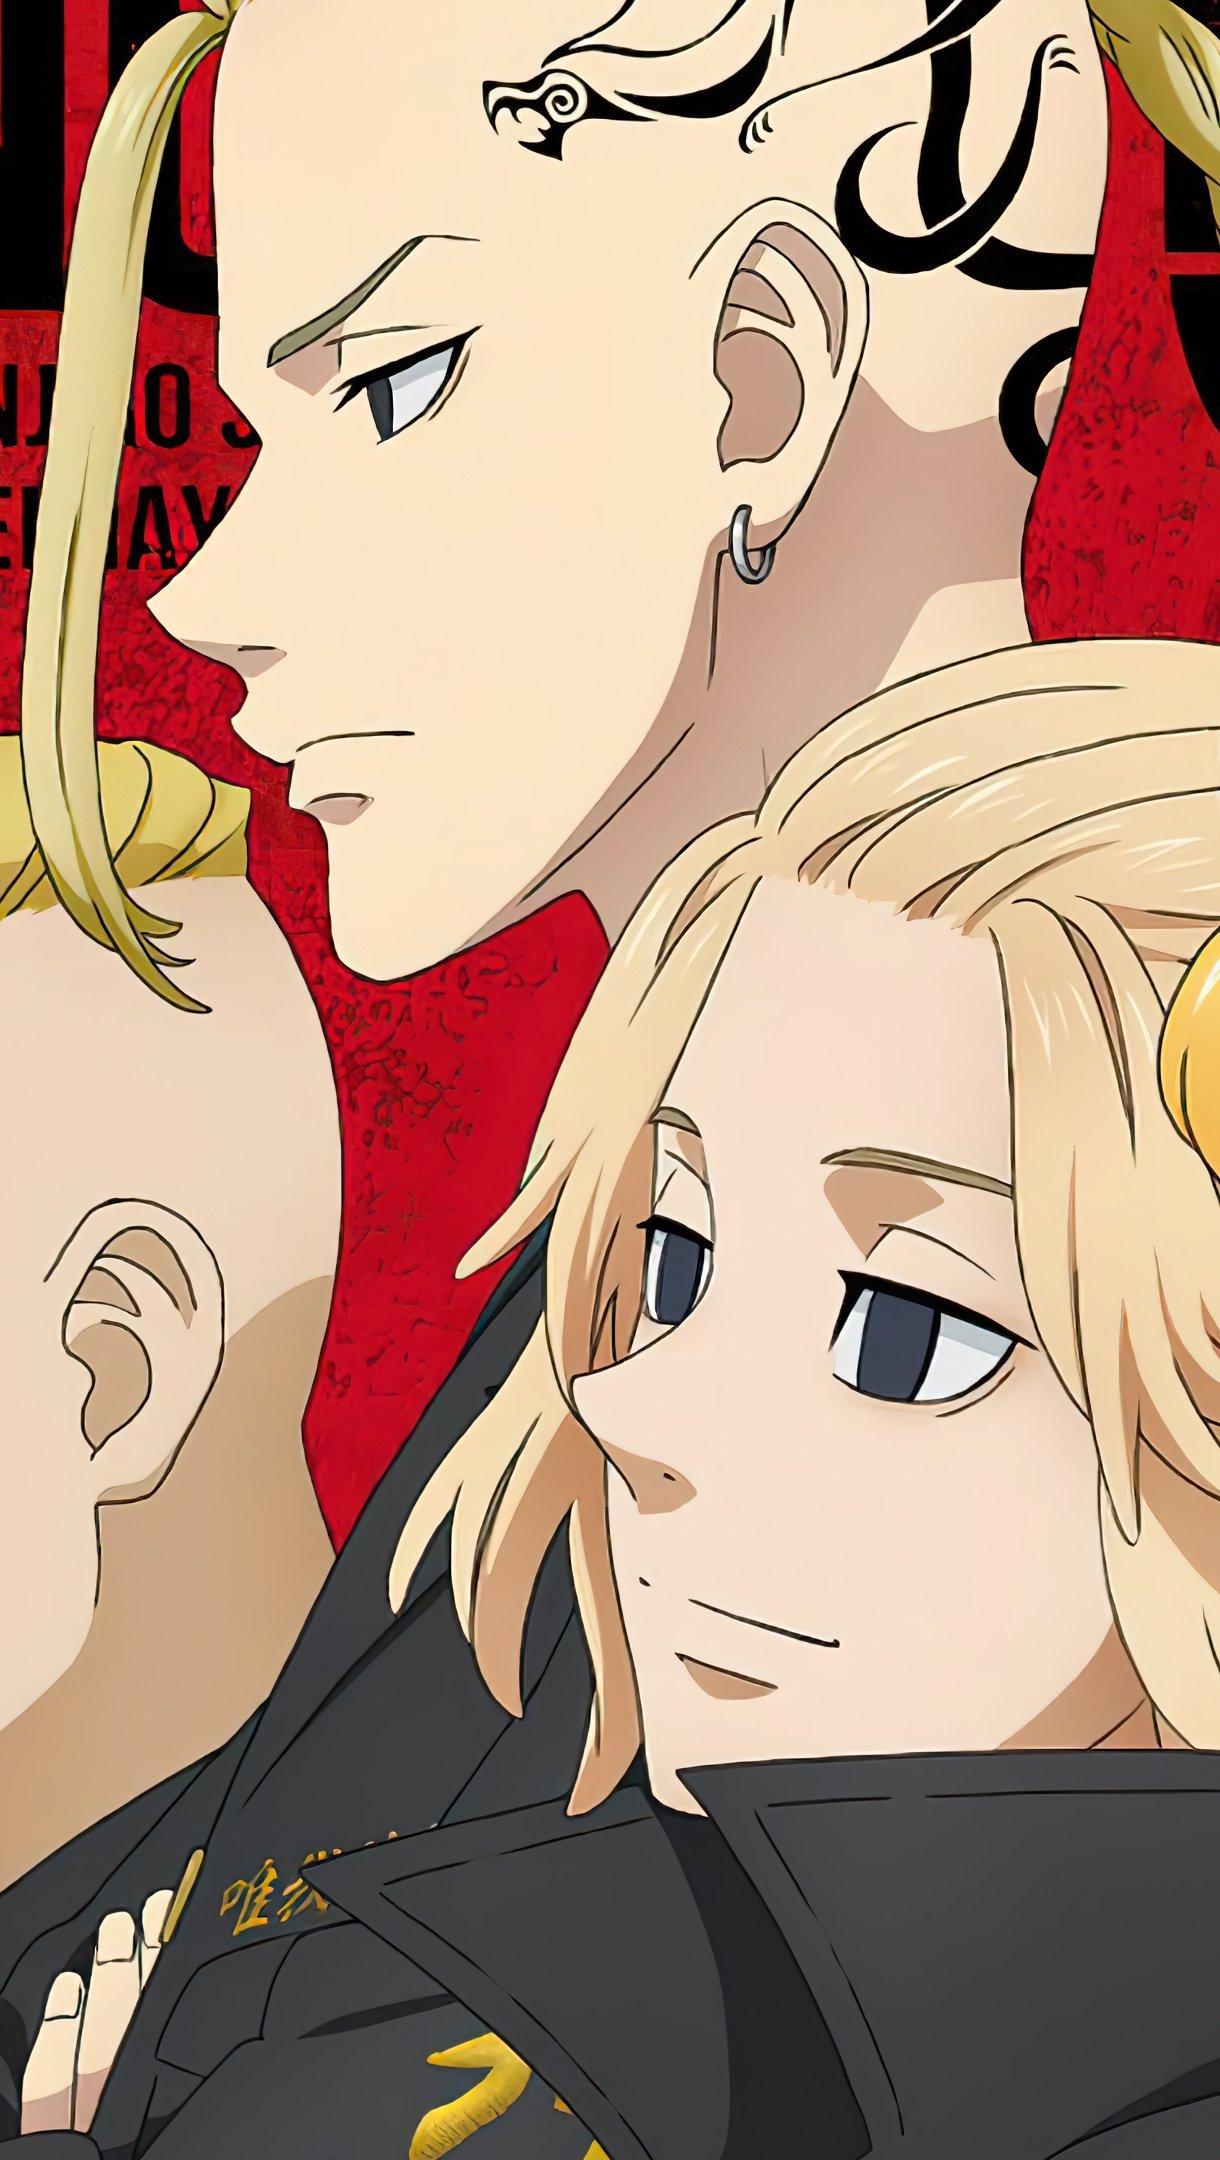 Fondos de pantalla Anime Personajes de Tokyo Revengers Vertical